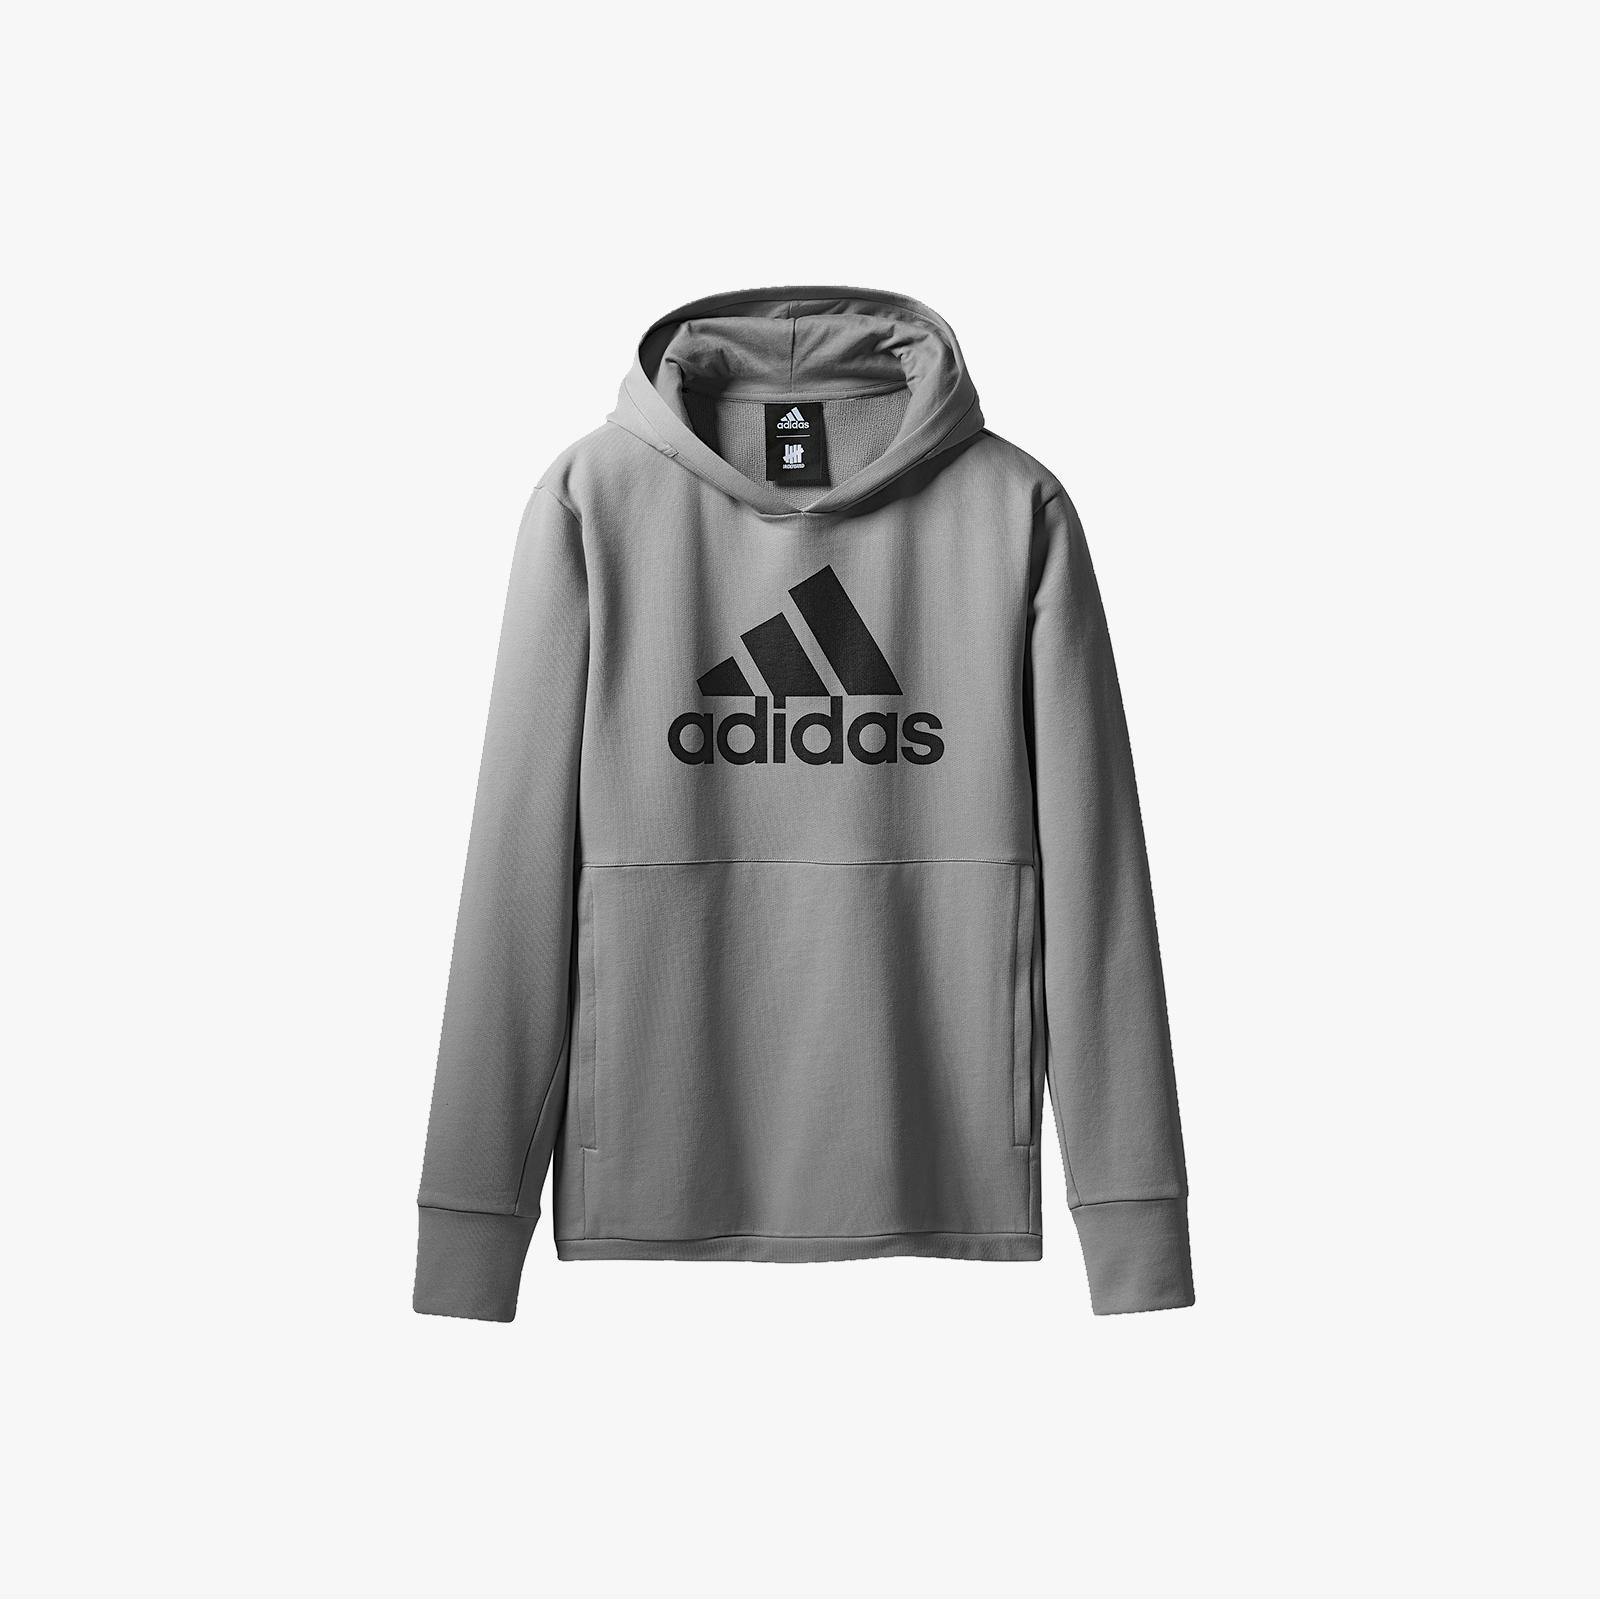 adidas Tech Hoodie x UNDFTD Dn8782 Sneakersnstuff